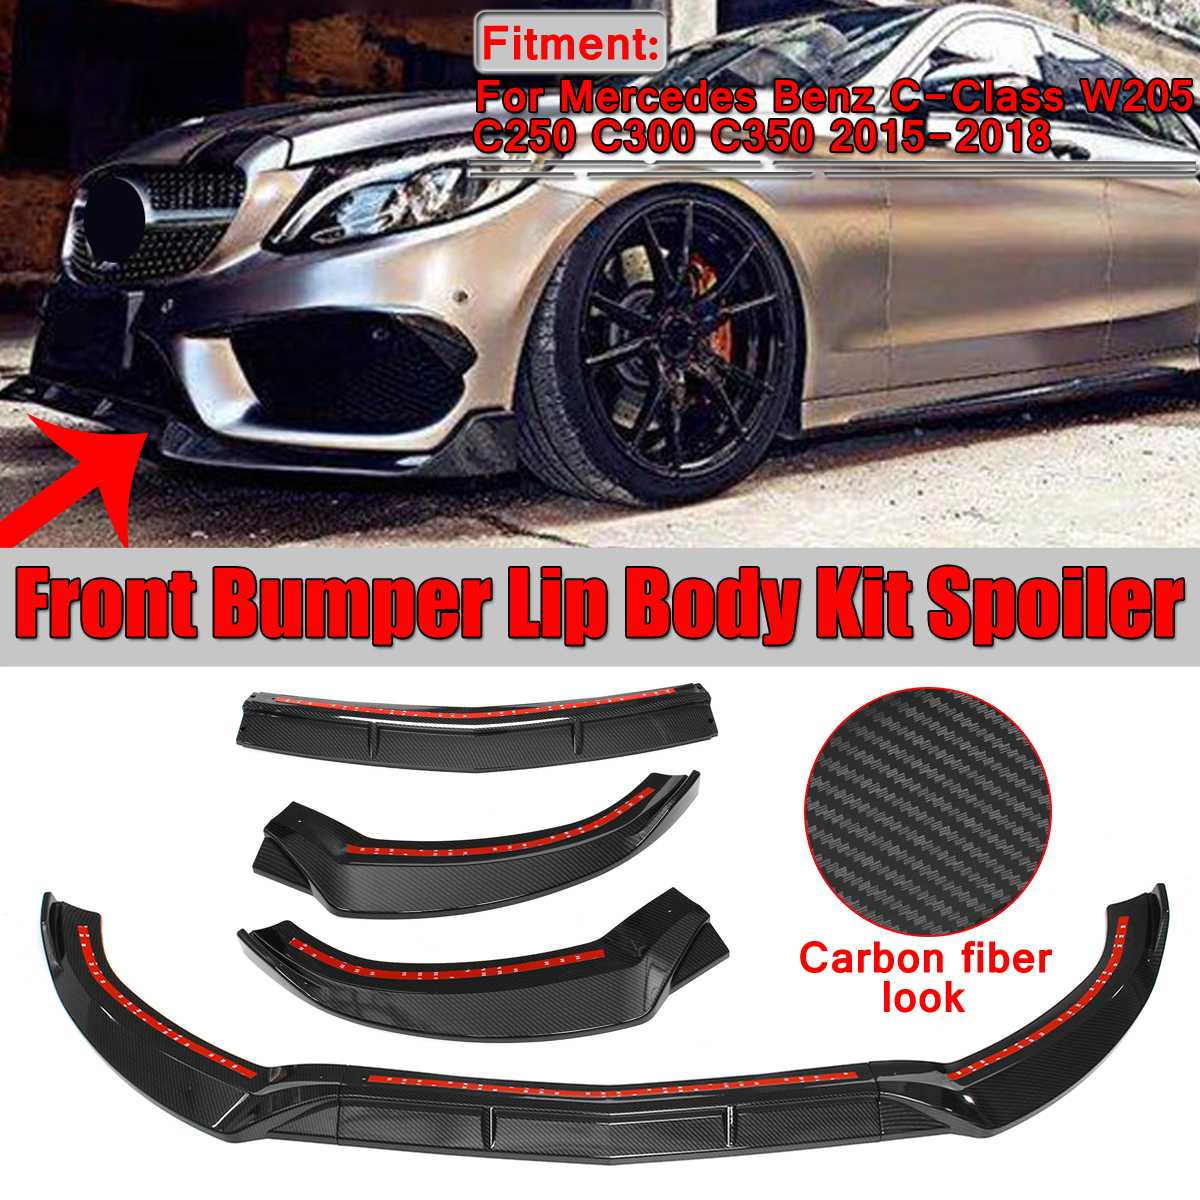 3Pcs W205 รถด้านหน้า Lip Chin สปอยเลอร์กันชนตัวแยก Body Kit สำหรับ Mercedes Benz C-Class w205 C250 C300 C350 2015-2018